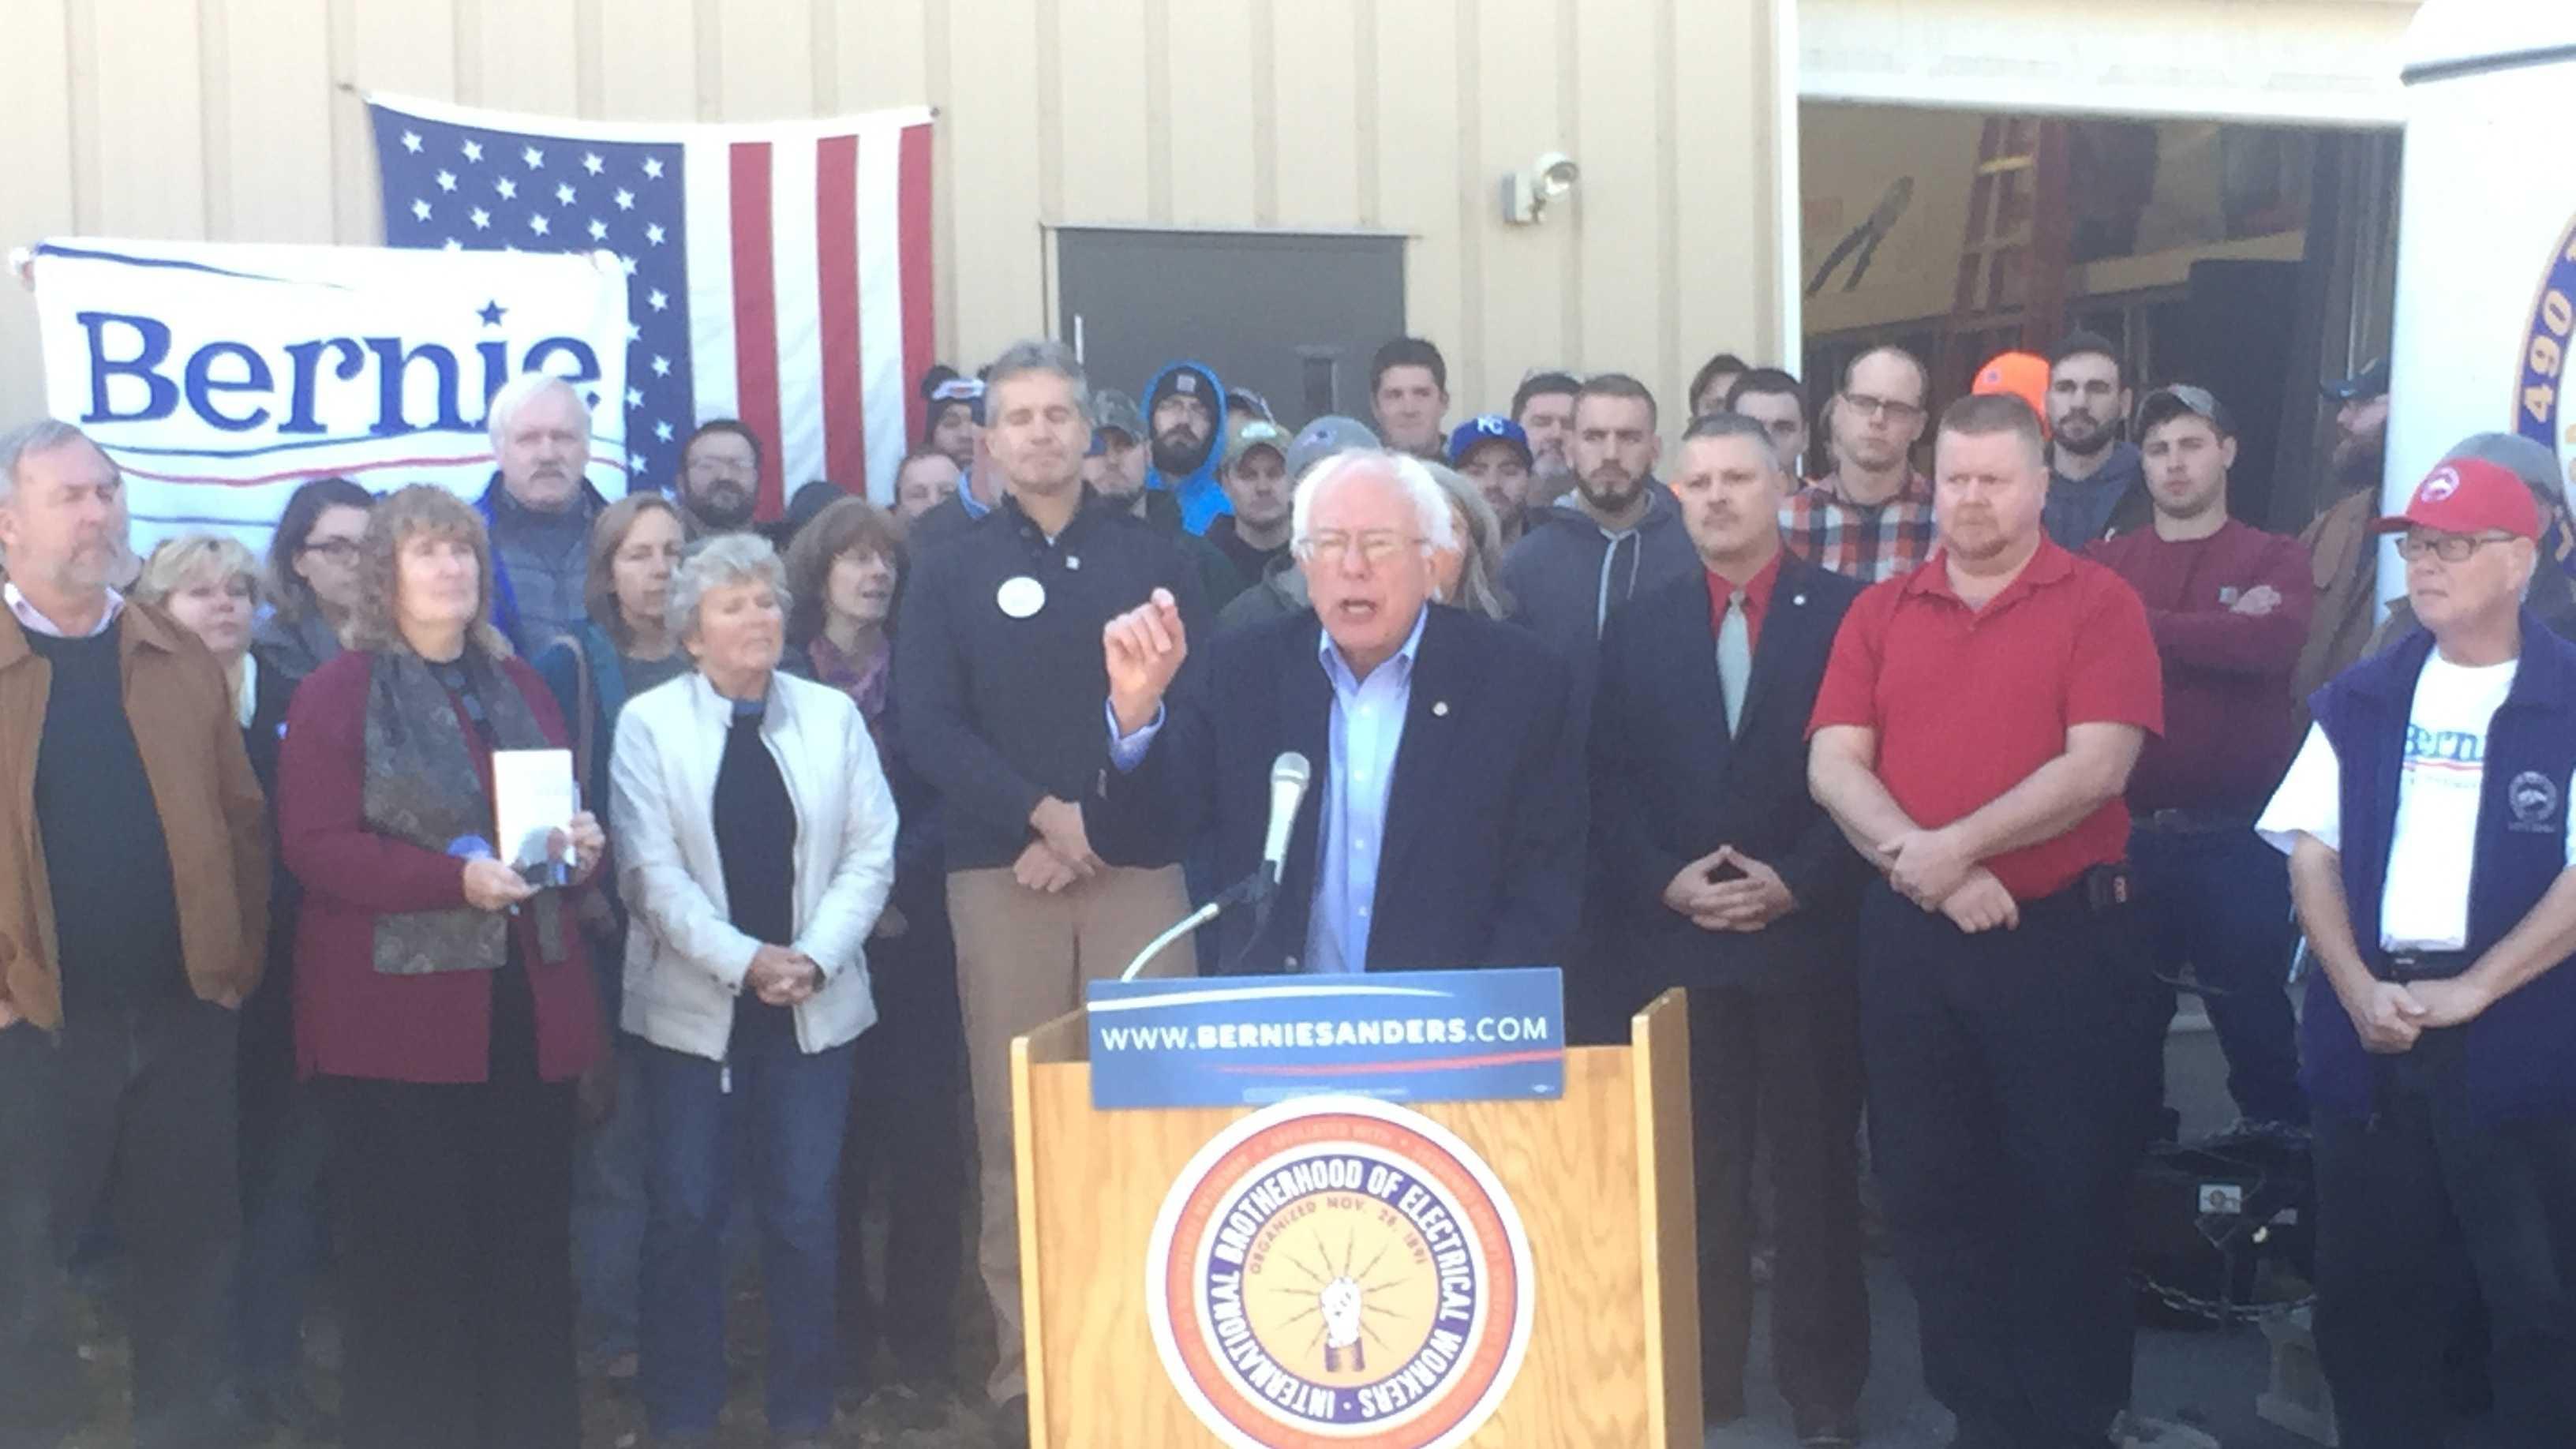 Sen. Bernie Sanders speaks at a news conference in Concord, N.H. on Saturday